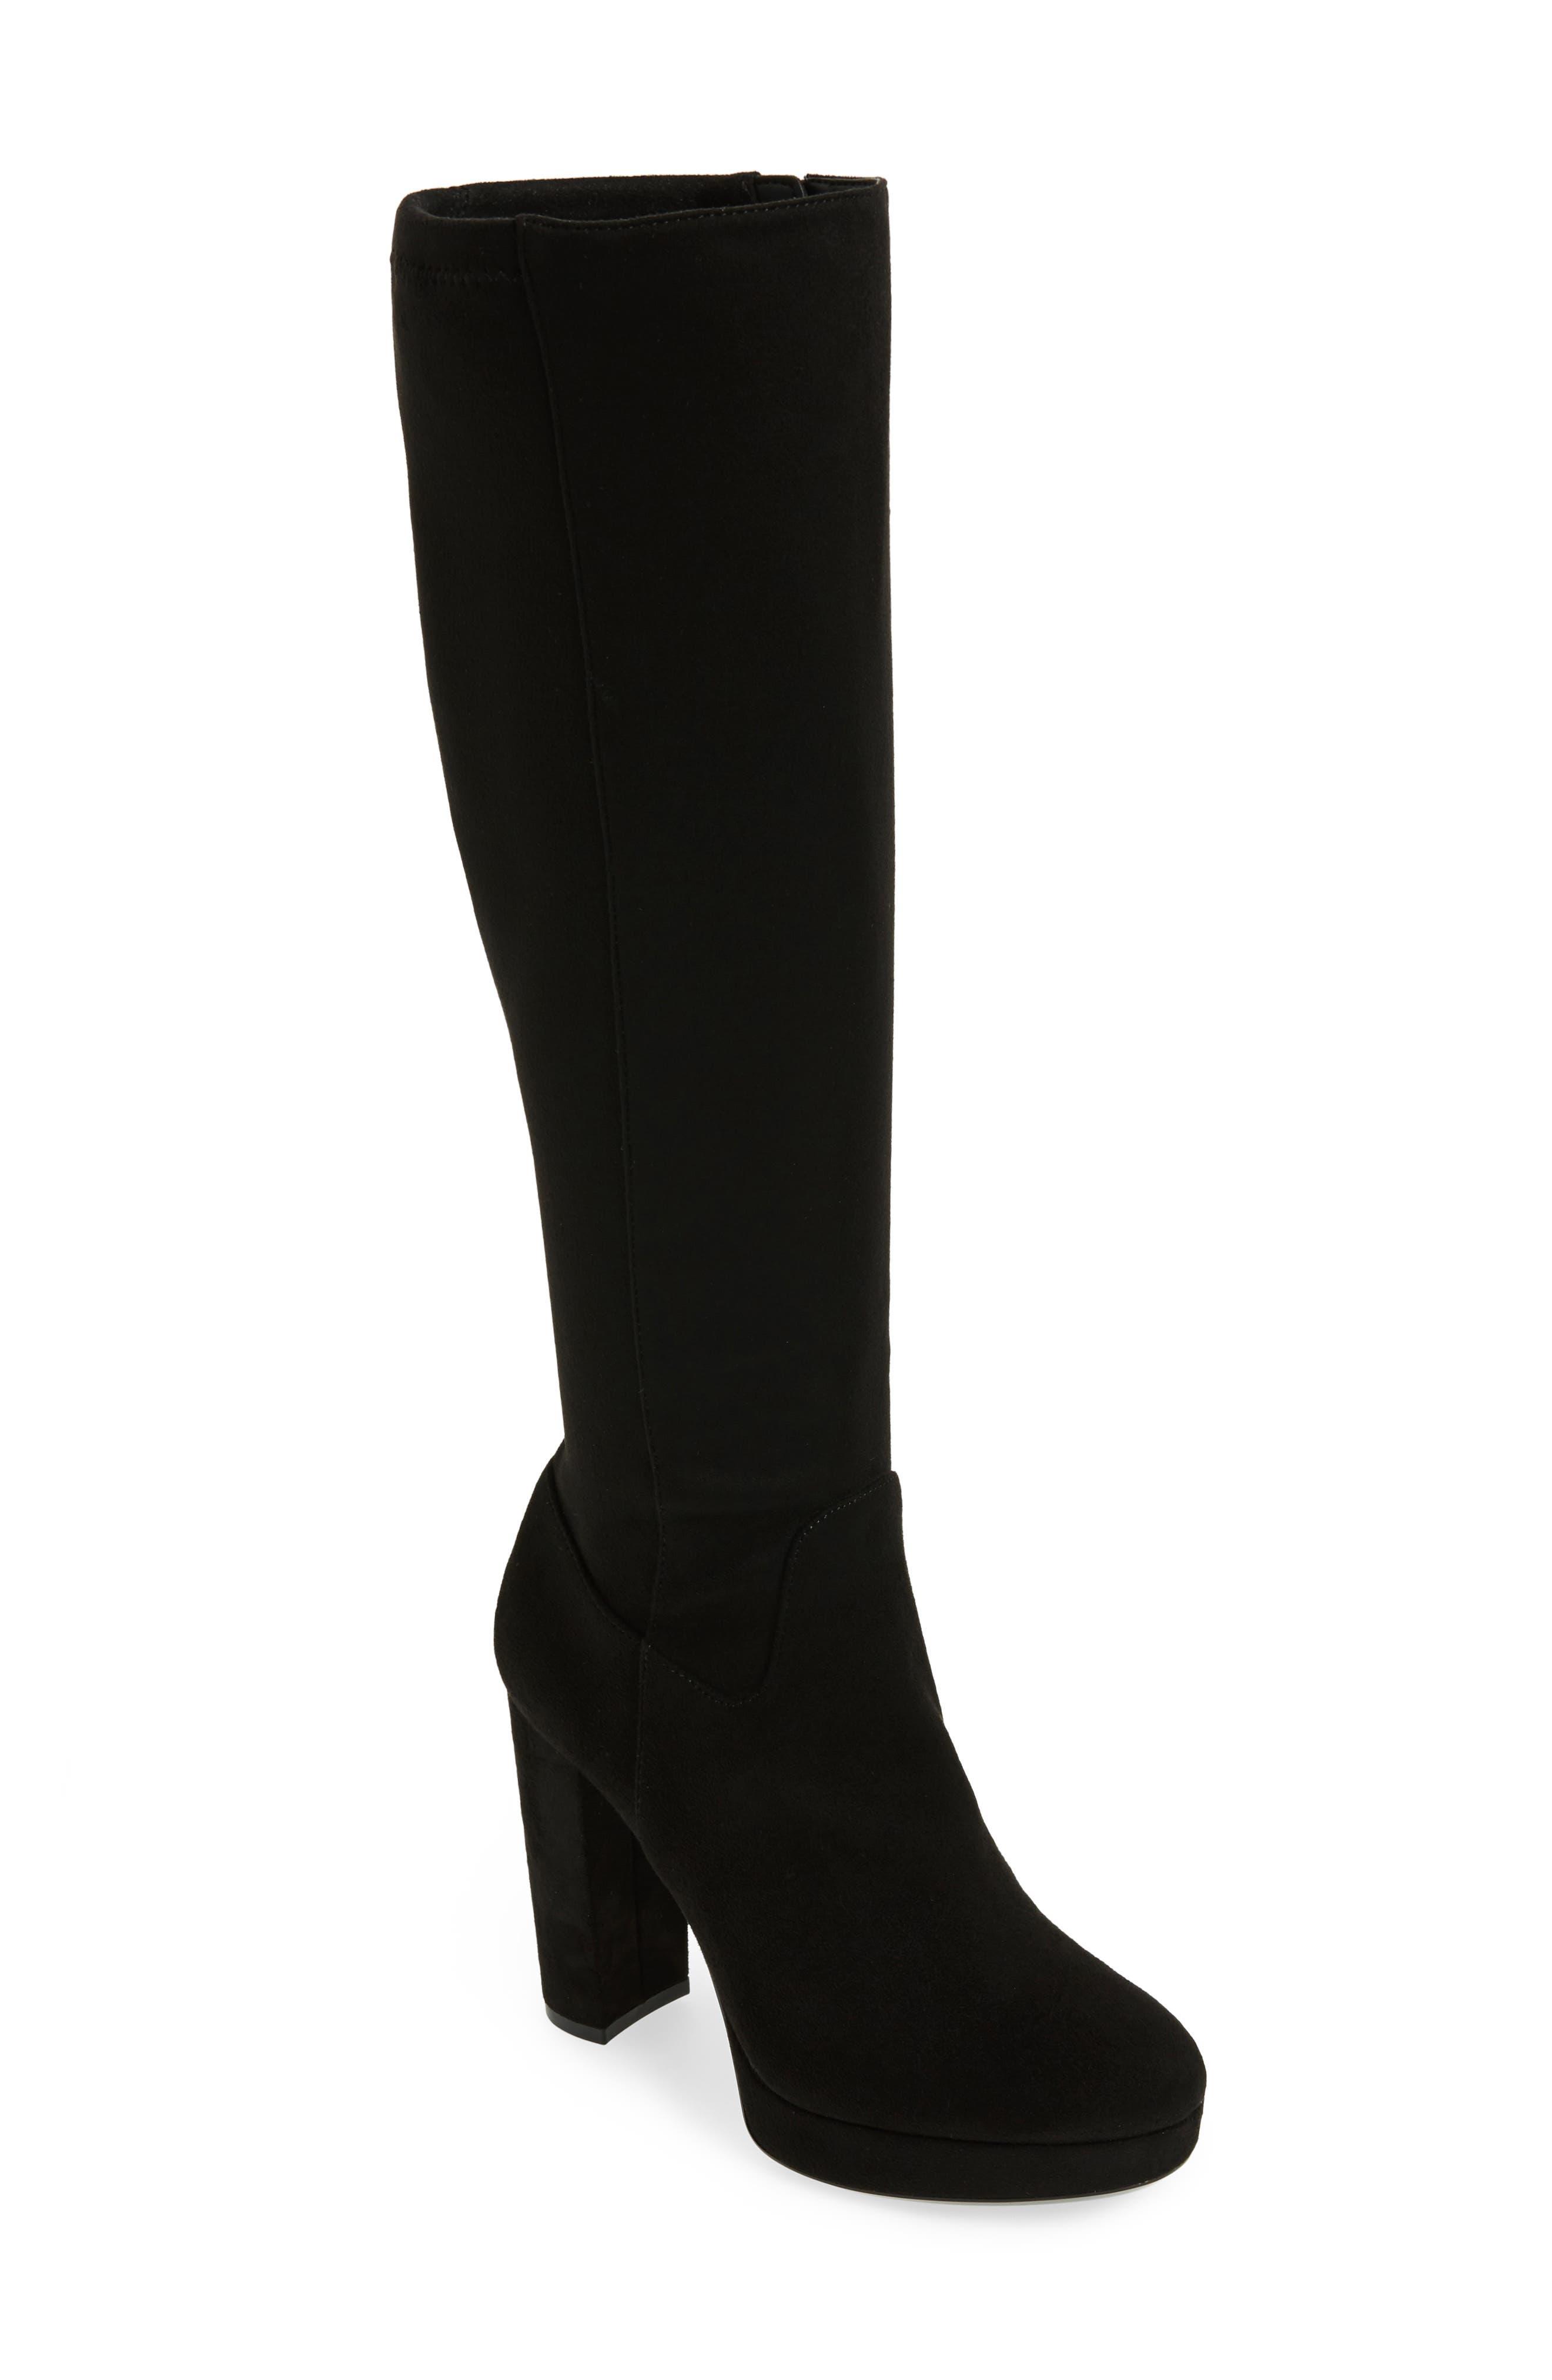 Alternate Image 1 Selected - Calvin Klein Mailia Tall Boot (Women)